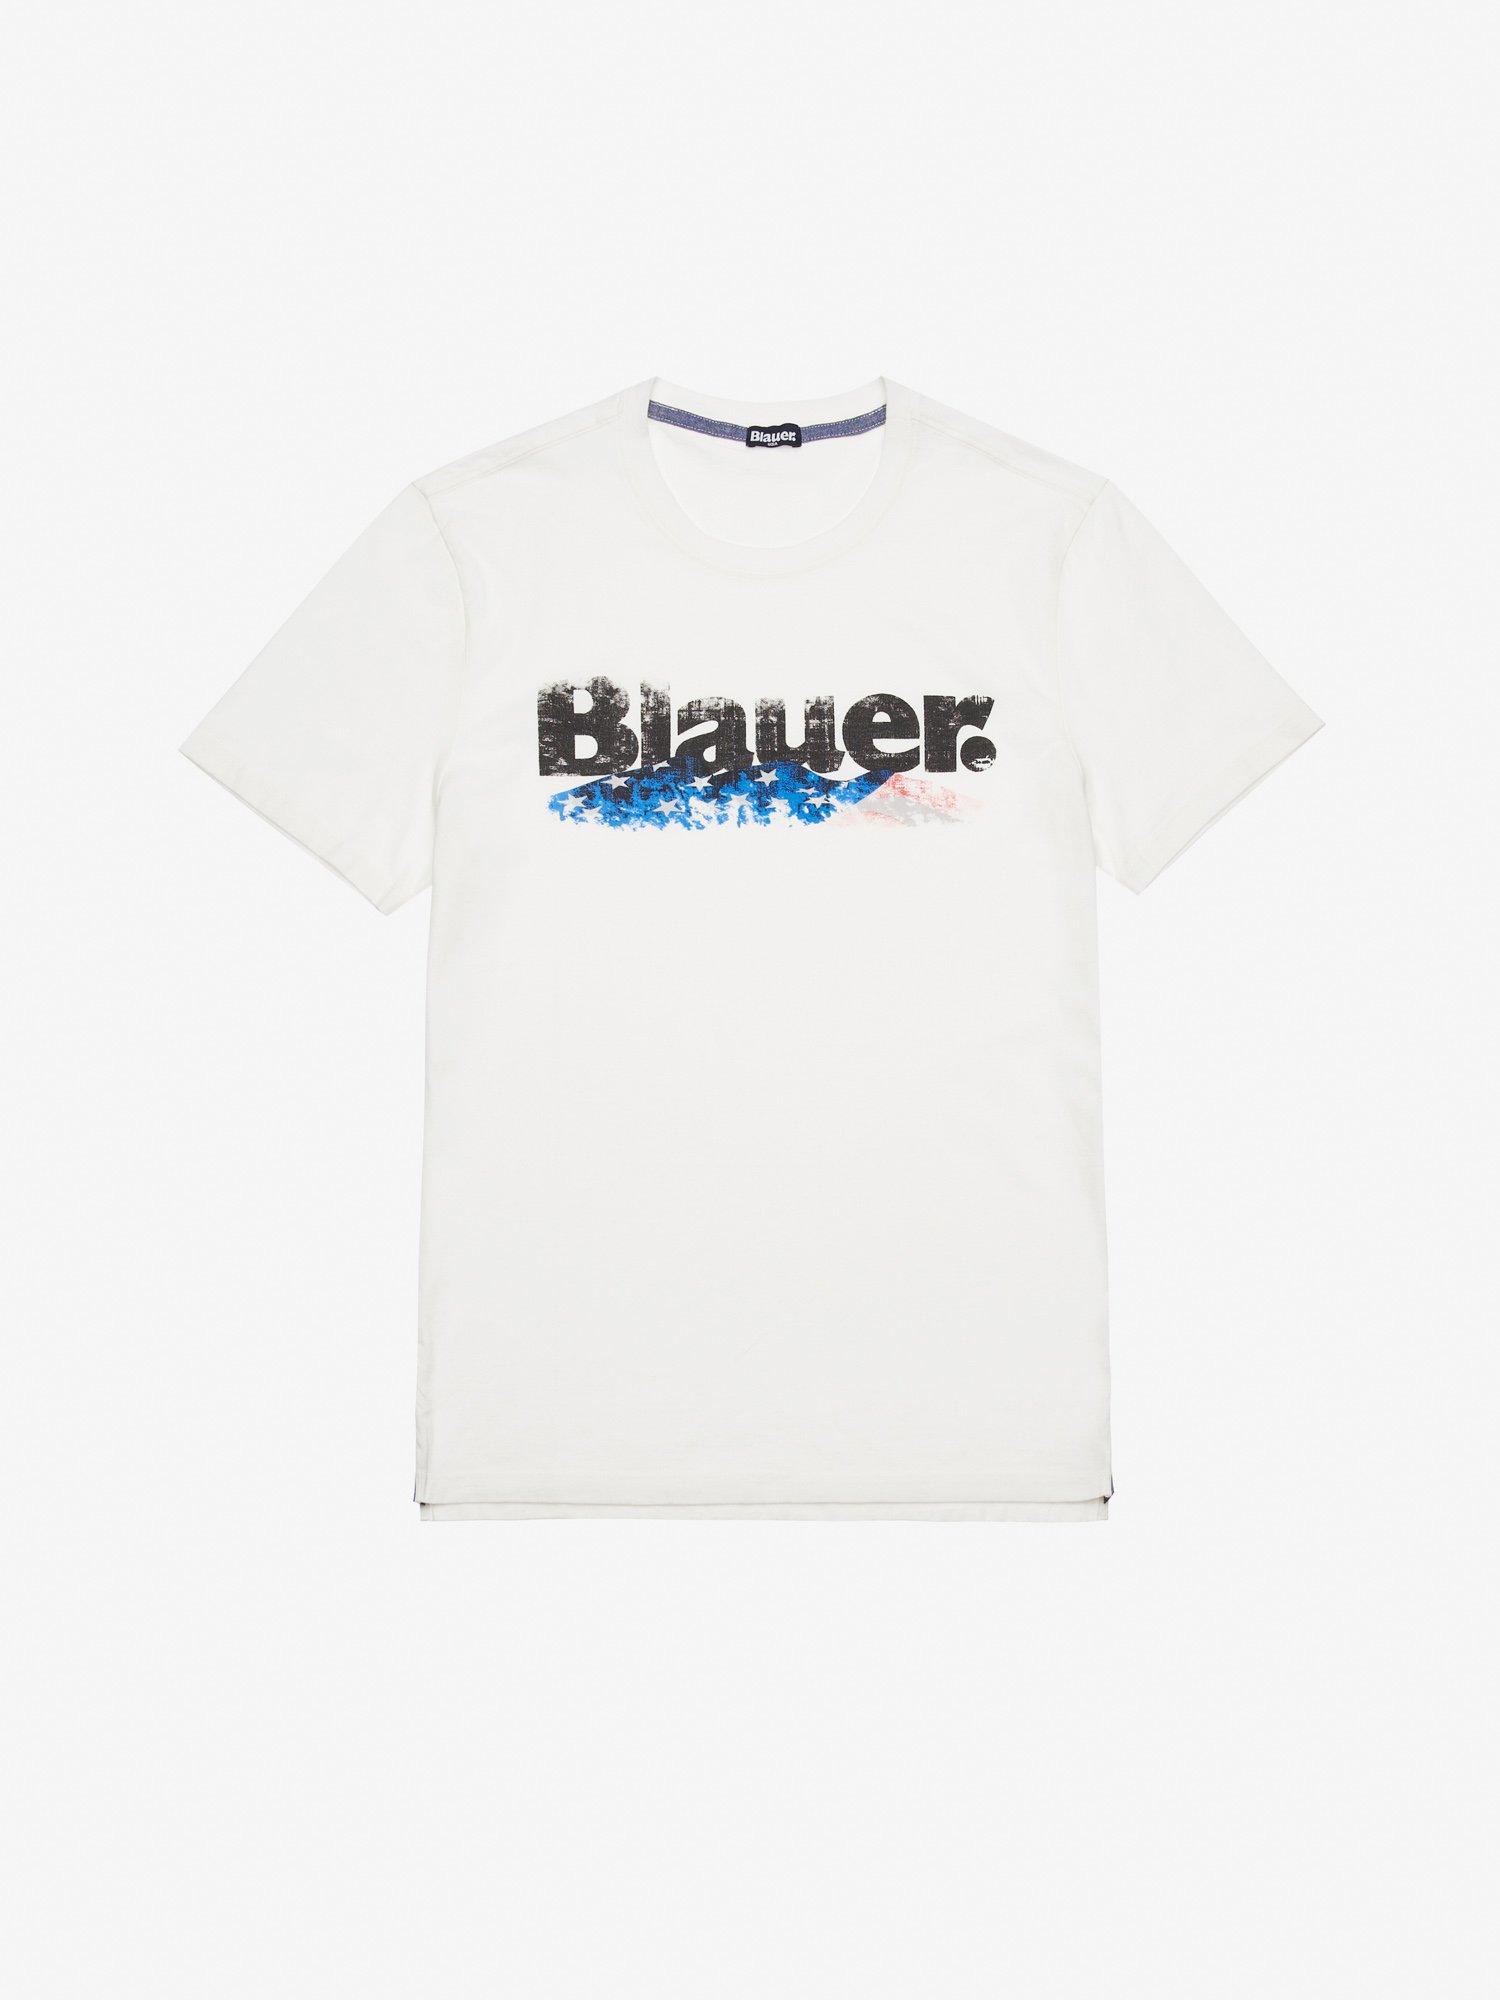 Blauer - T-SHIRT UOMO IN JERSEY TINTO CAPO - Giglio - Blauer